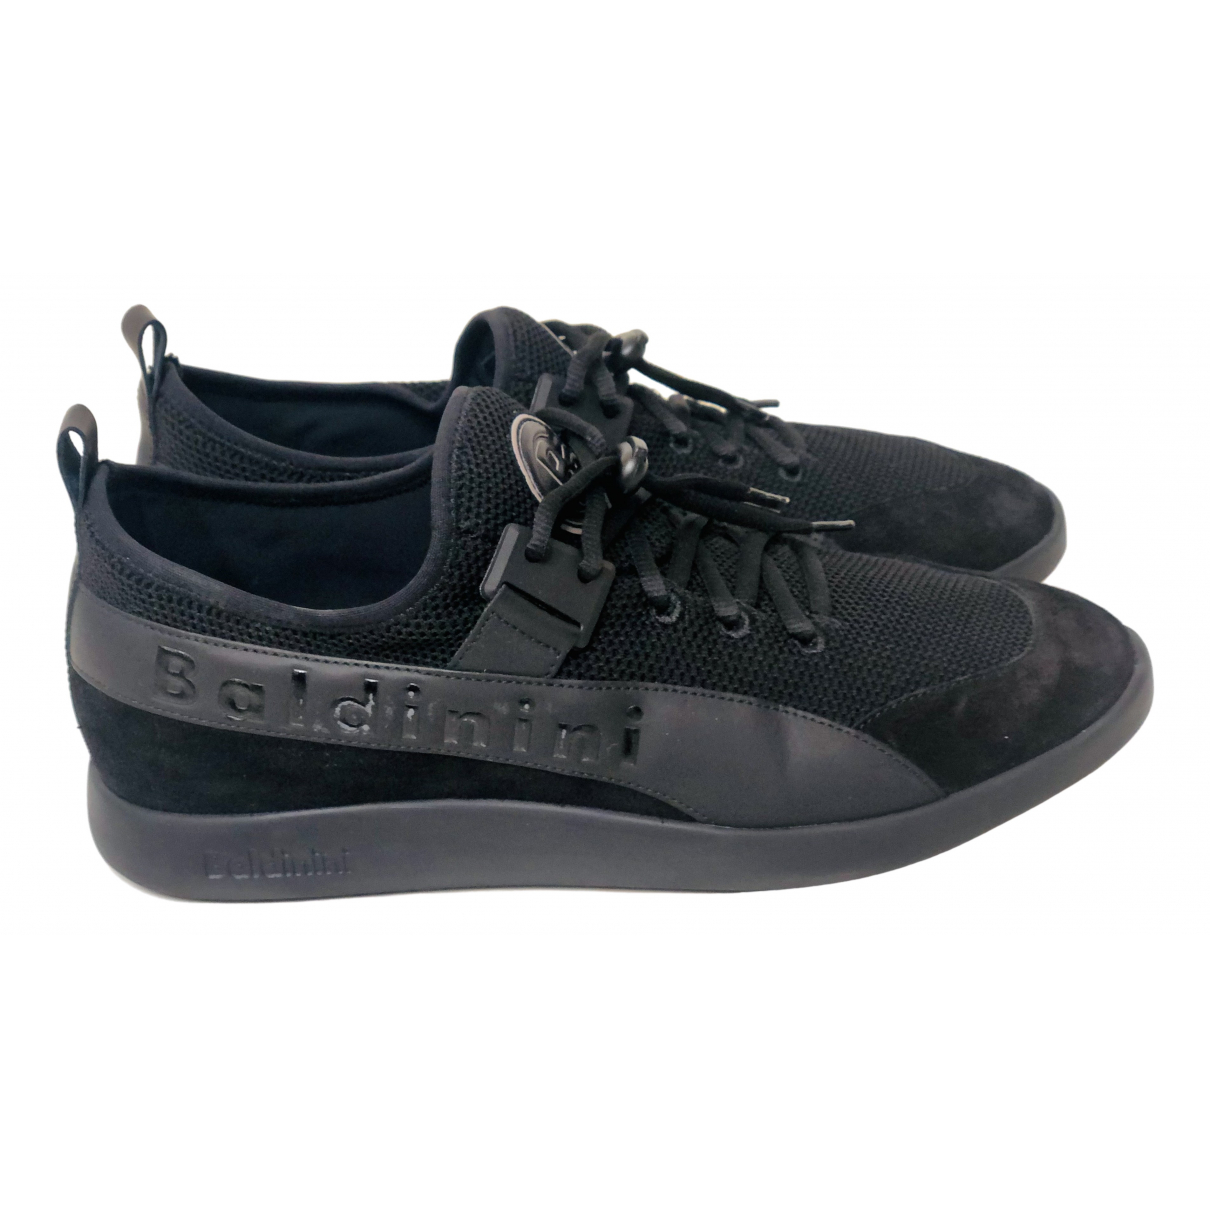 Baldinini N Black Cloth Trainers for Men 44 IT